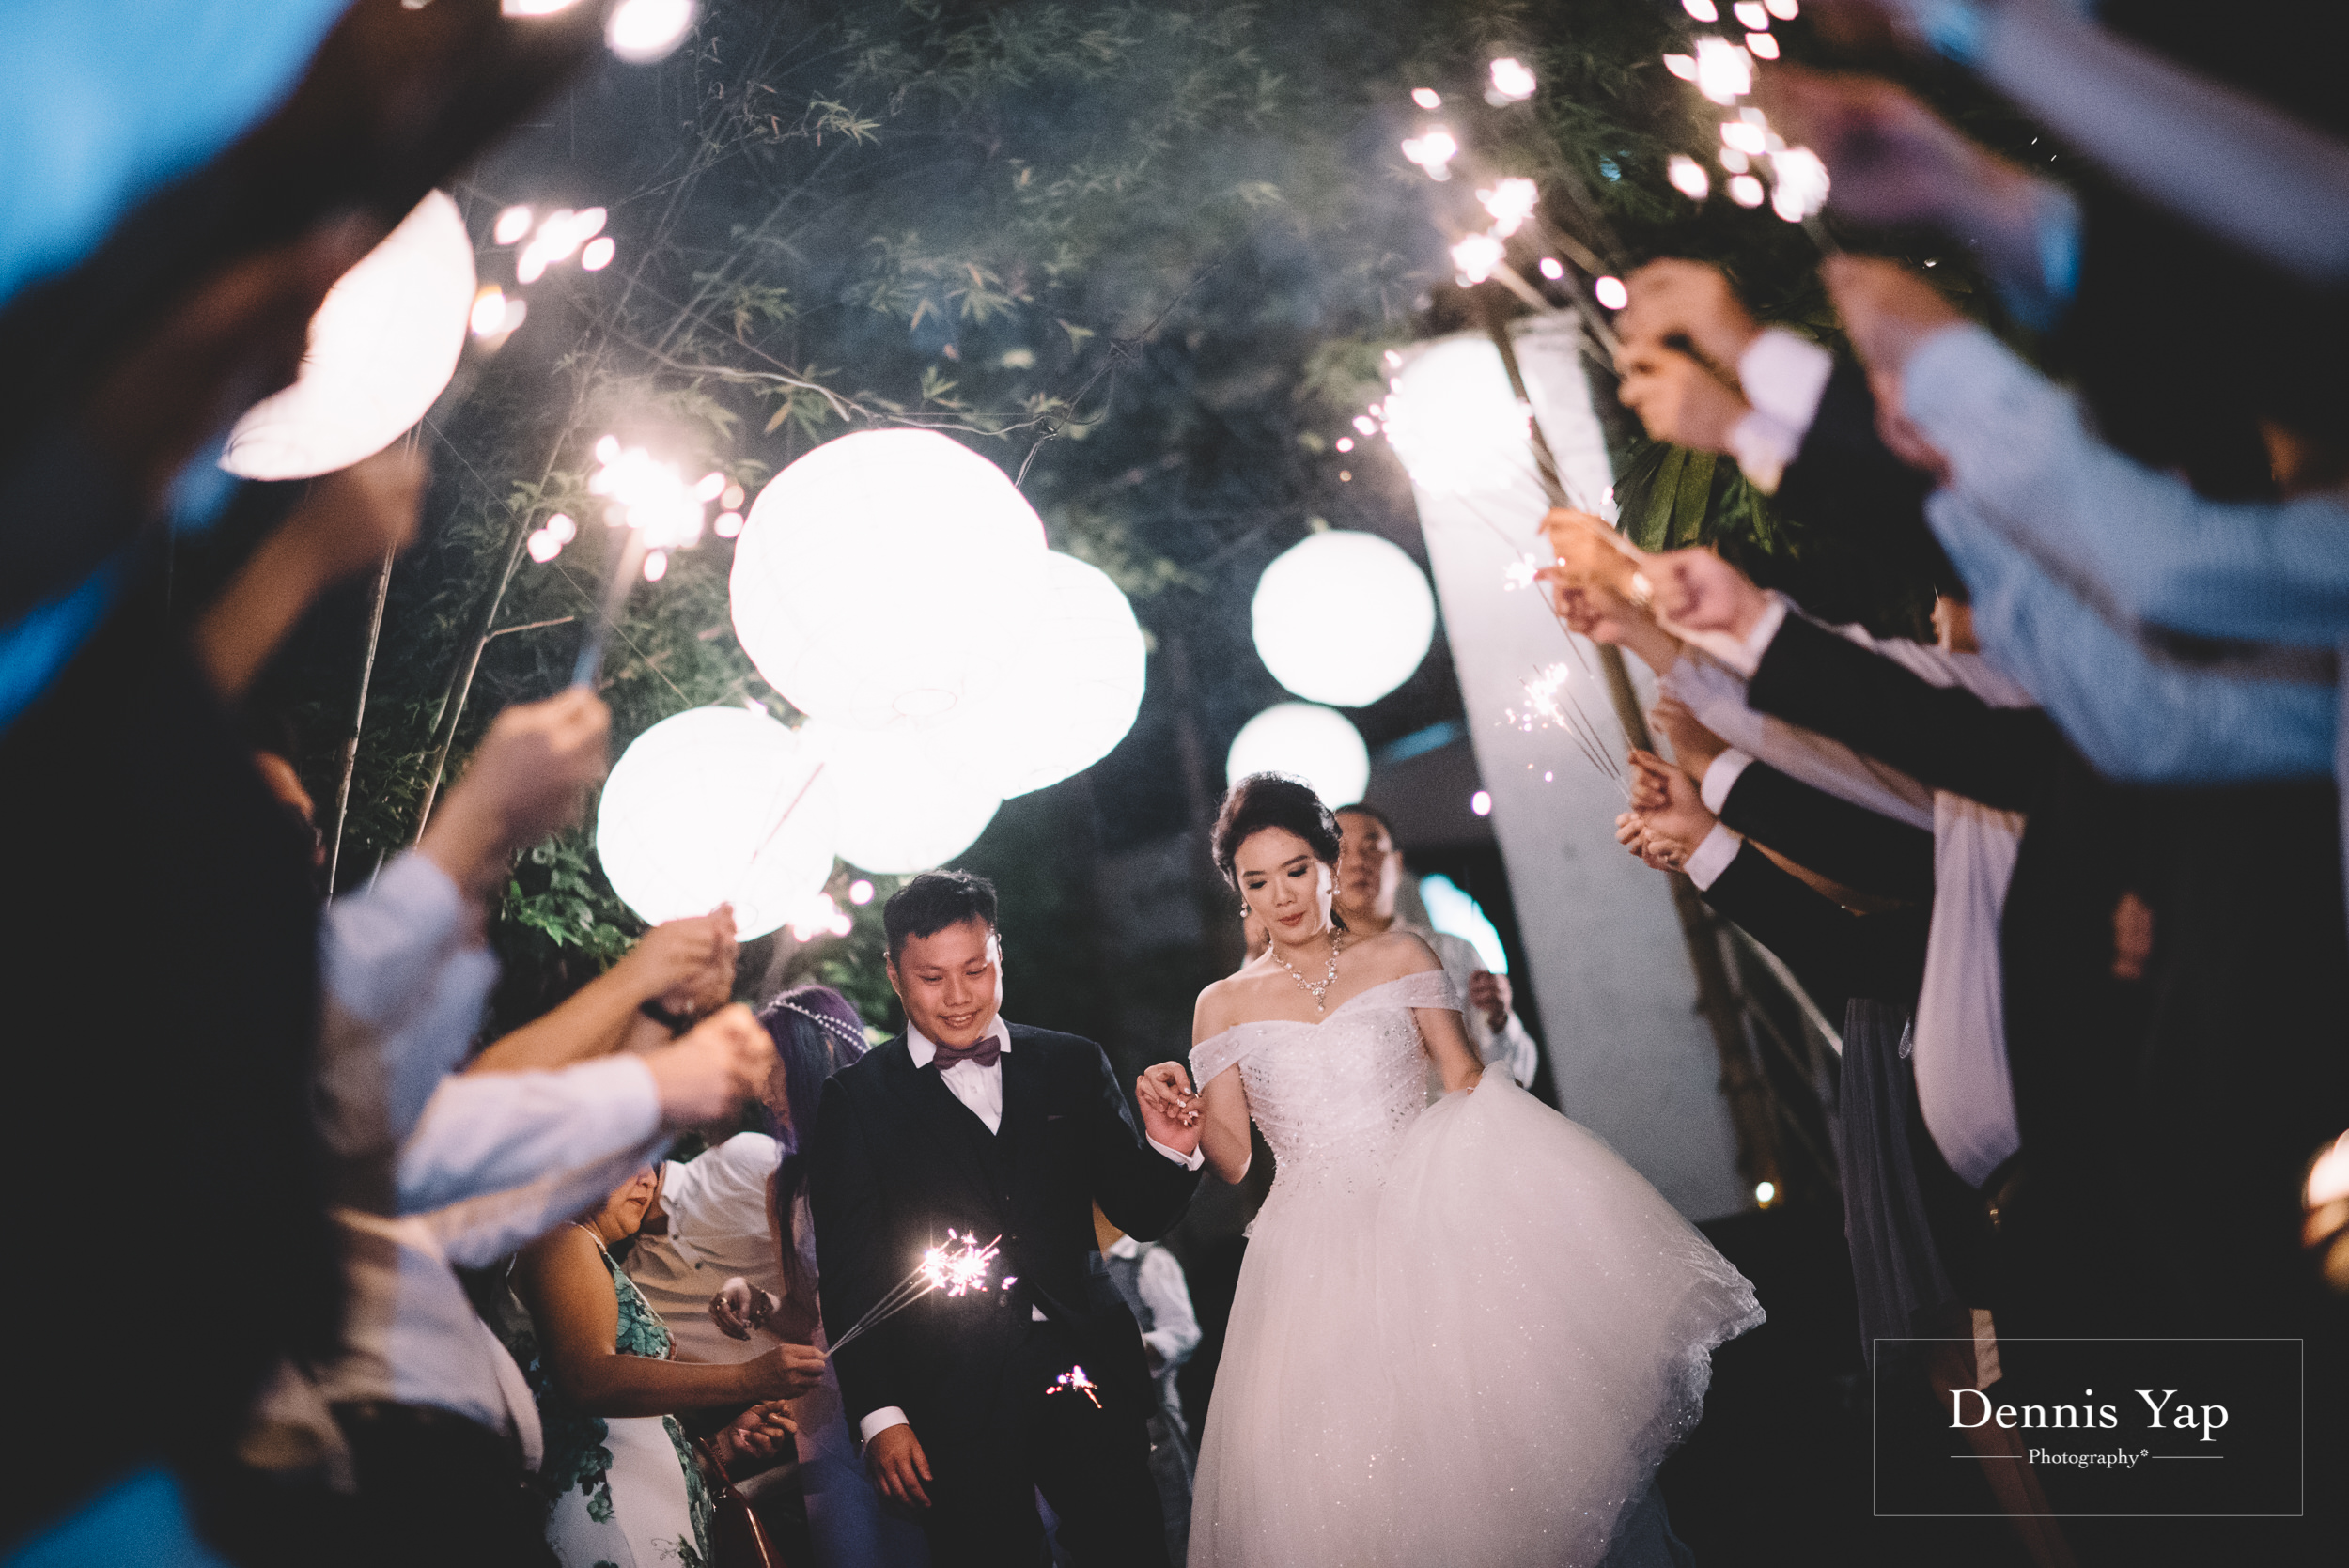 vincent peggy wedding dinner neo tamarind kuala lumpur dennis yap photography-28.jpg